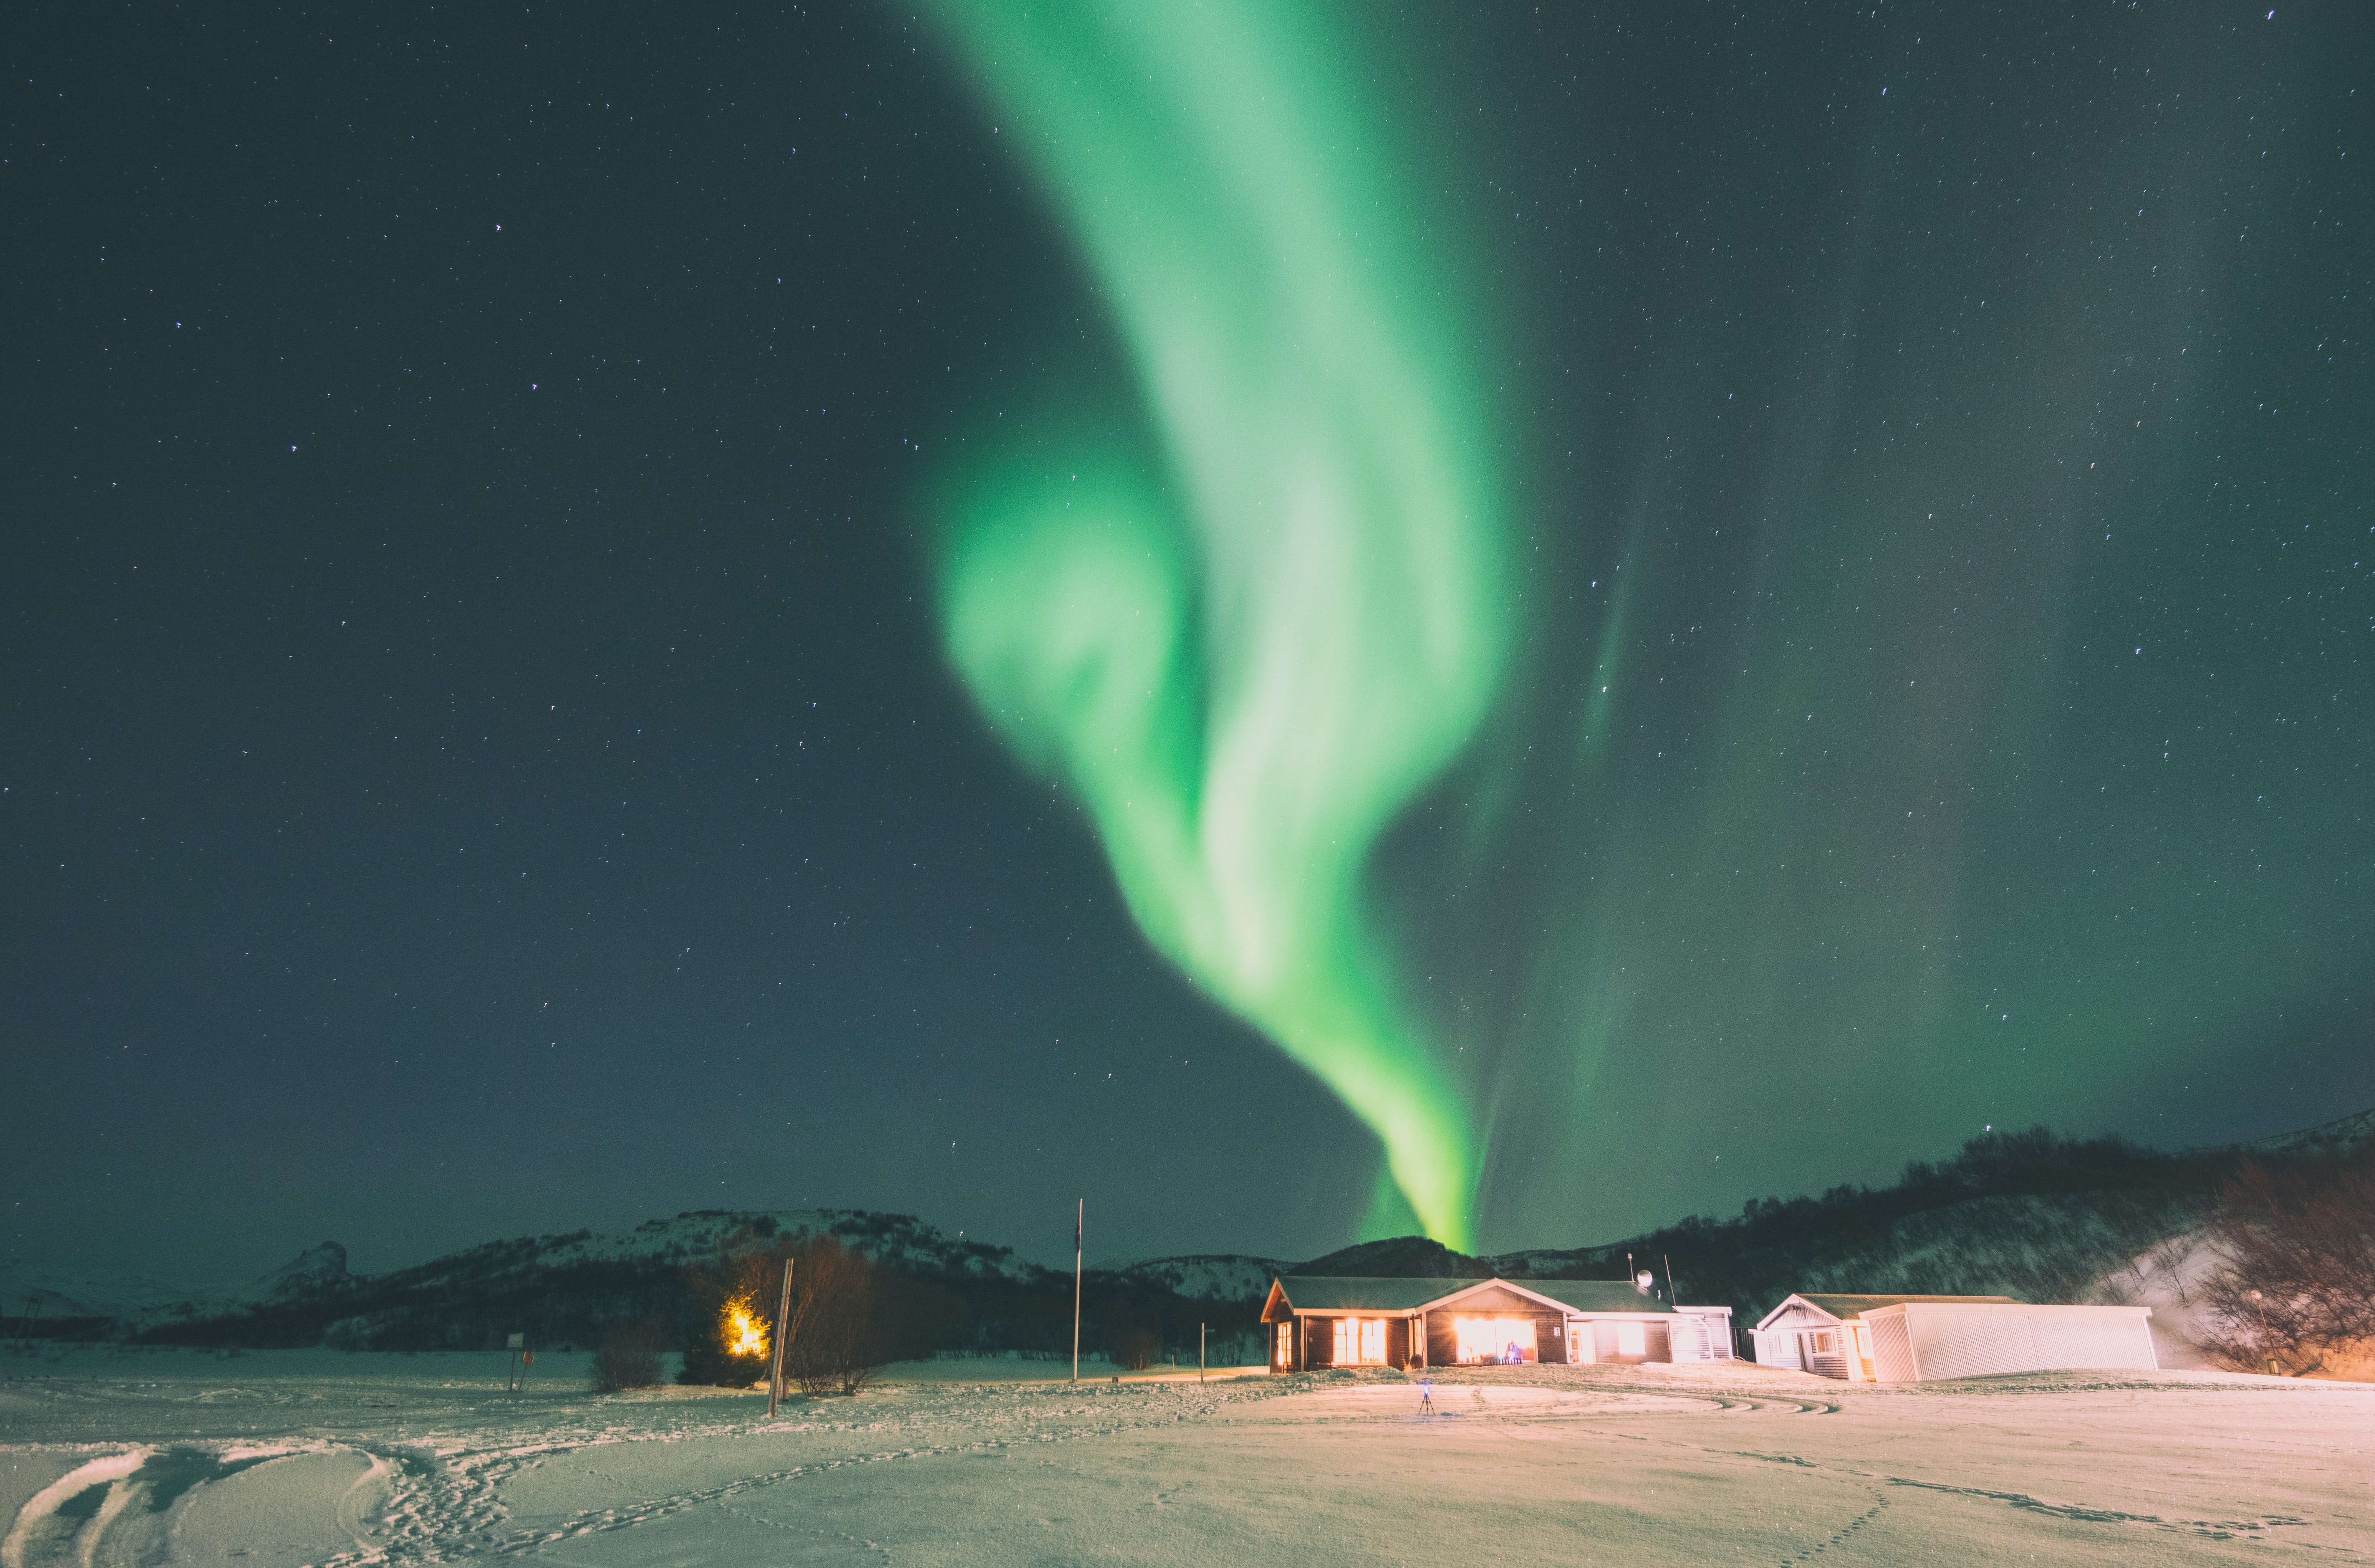 aurora borealis during winter